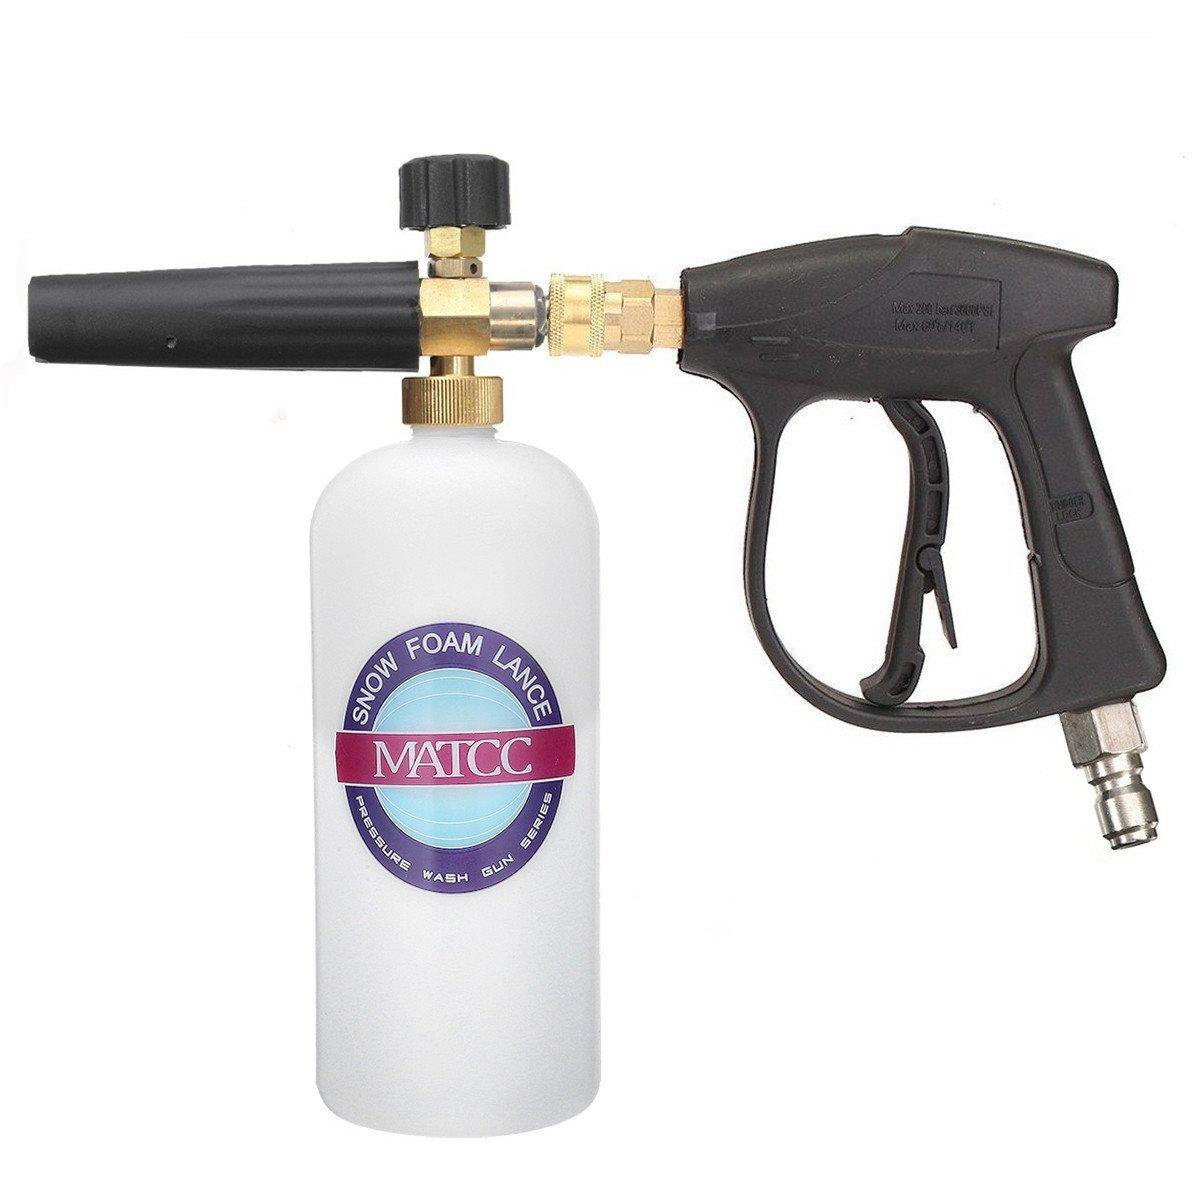 MATCC Foam Wash Gun 3000 PSI High Pressure Washer Jet Snow Foam Lance Foam Cannon Foam Blaster with 3/8'' Connector